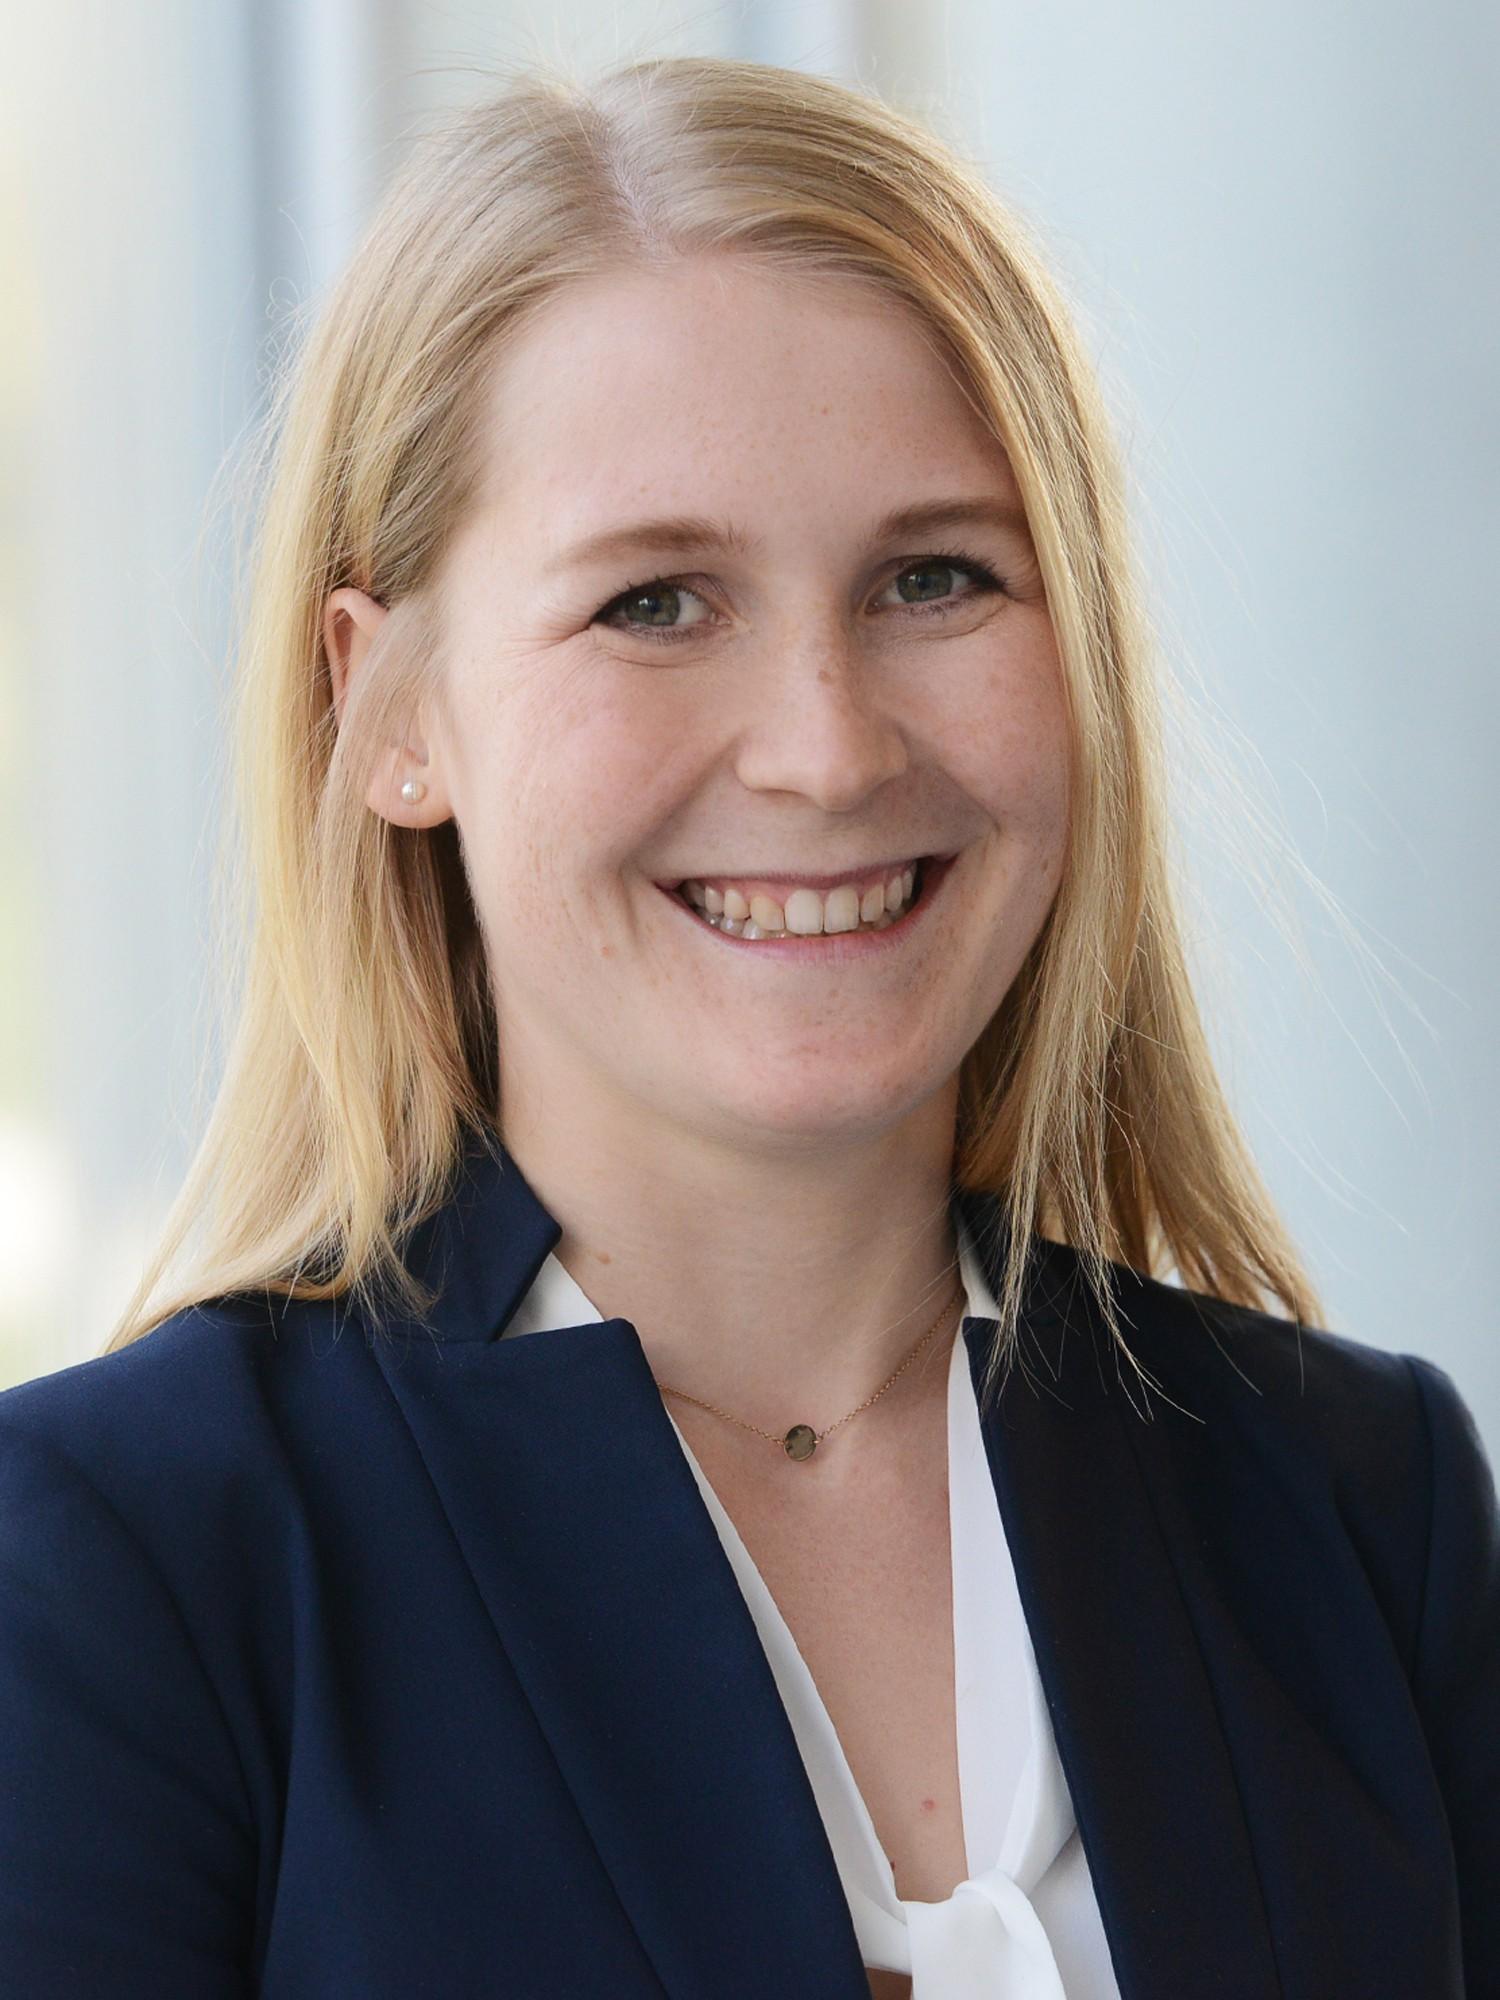 Alina Buchner